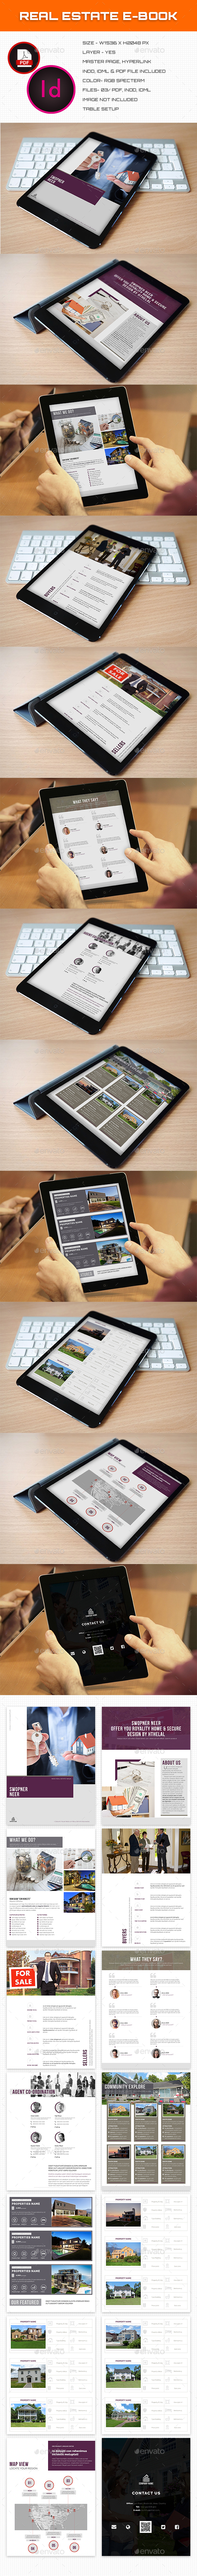 Real Estate E-book - ePublishing